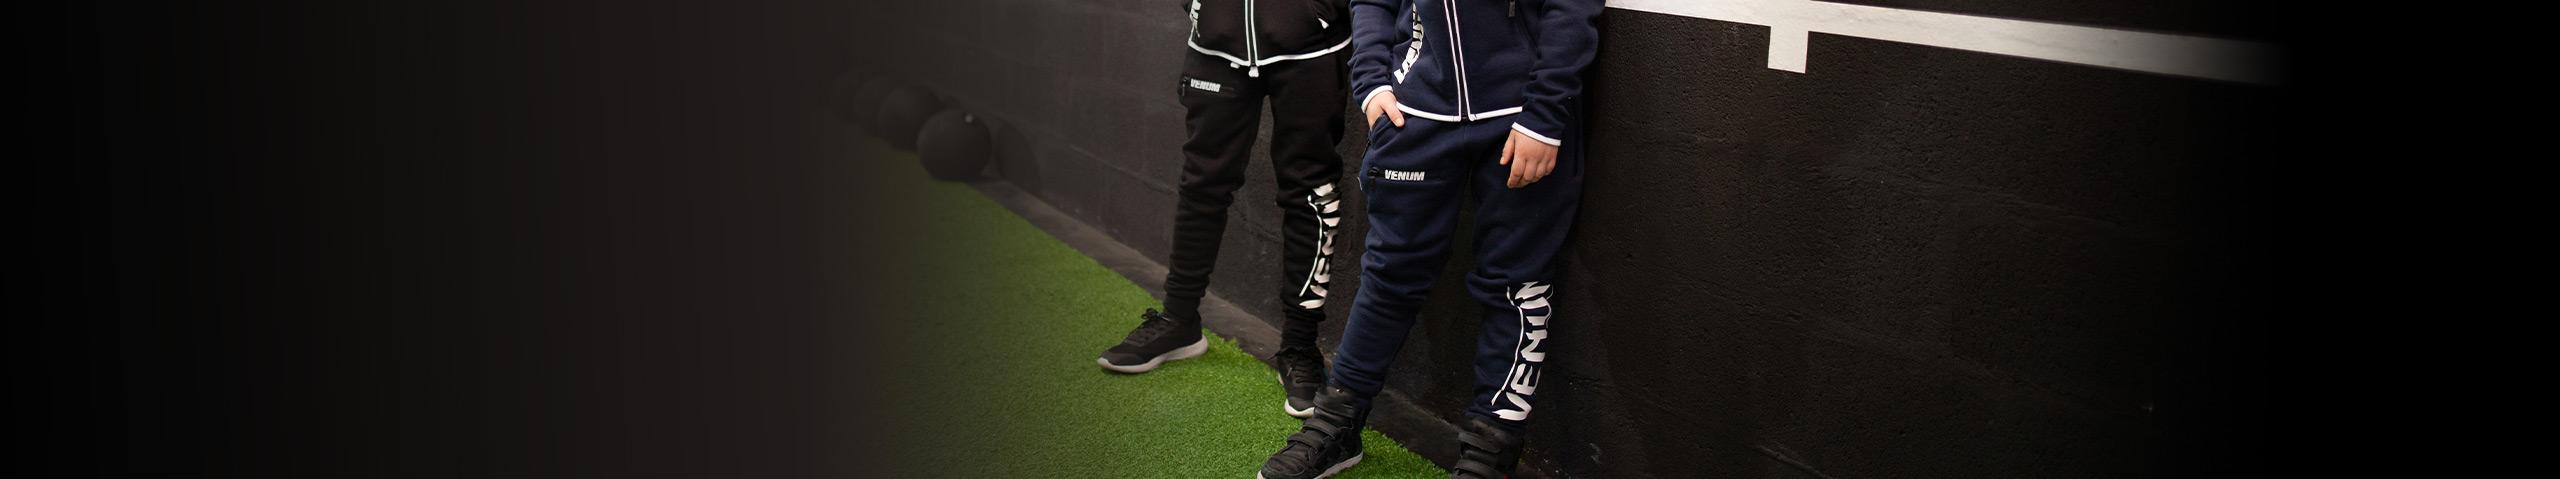 Kids' joggers : all Venum sweatpants & tracksuit trousers for kids | Venum.com Asia